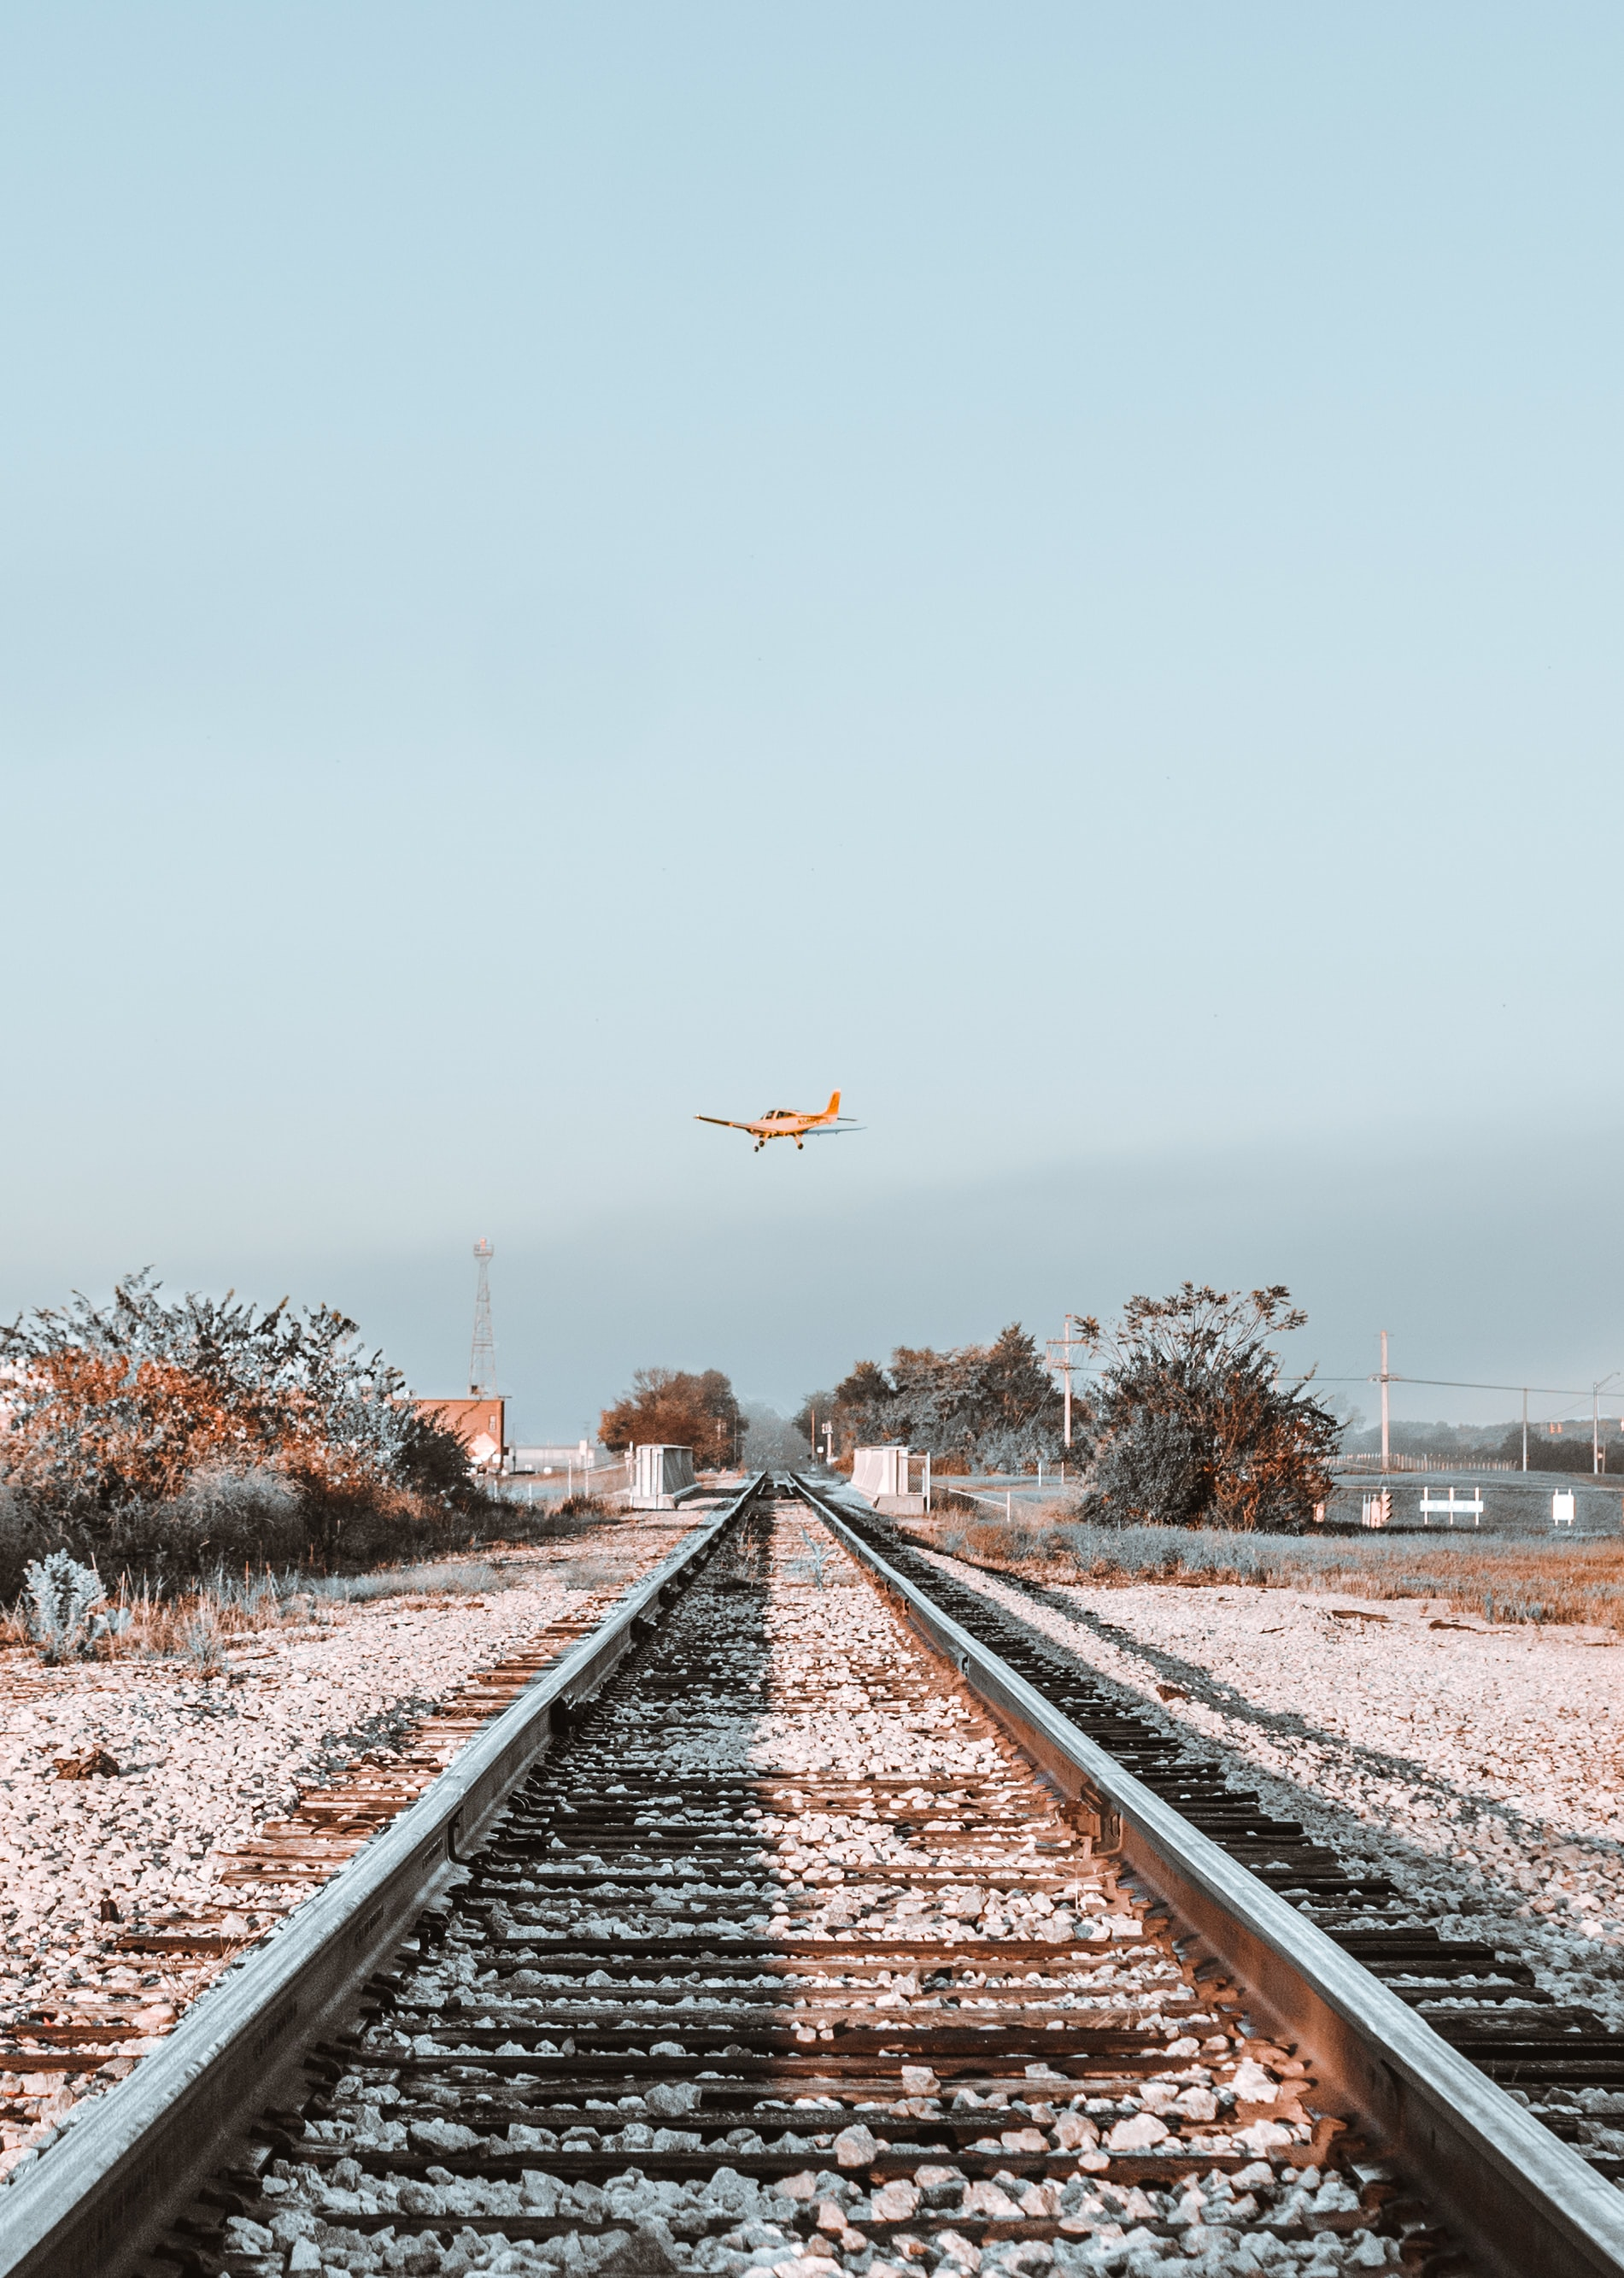 orange monoplane flying above a railroad